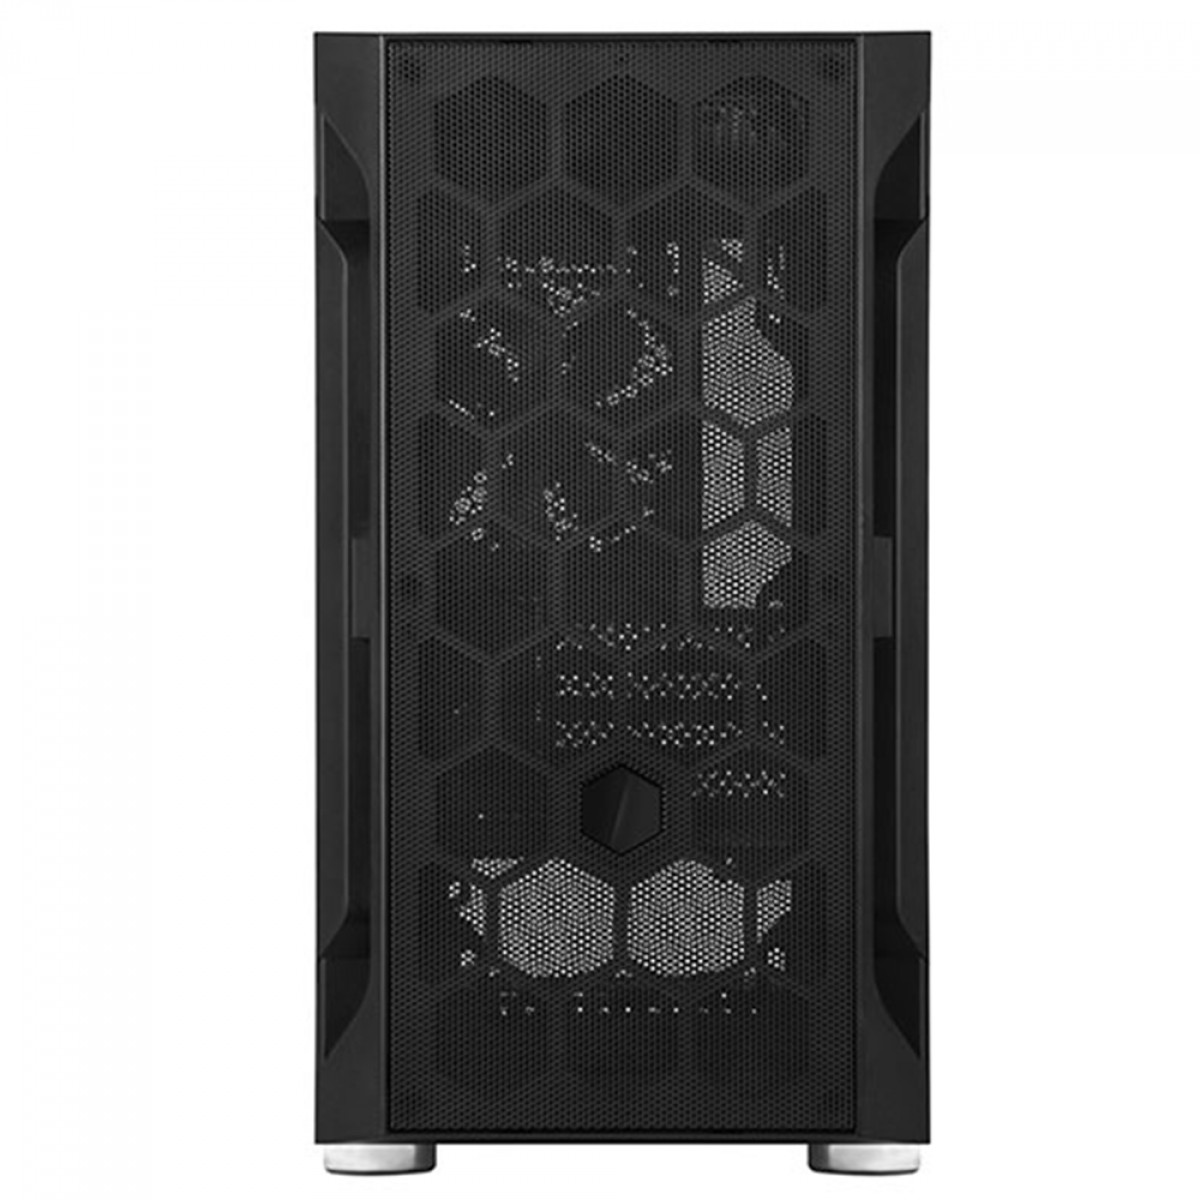 Gabinete Gamer SilverStone Fara H1M, Mini Tower, Vidro Temperado, Black, Micro-ATX, Sem Fonte, Com 1 Fan, SST-FAH1MB-G